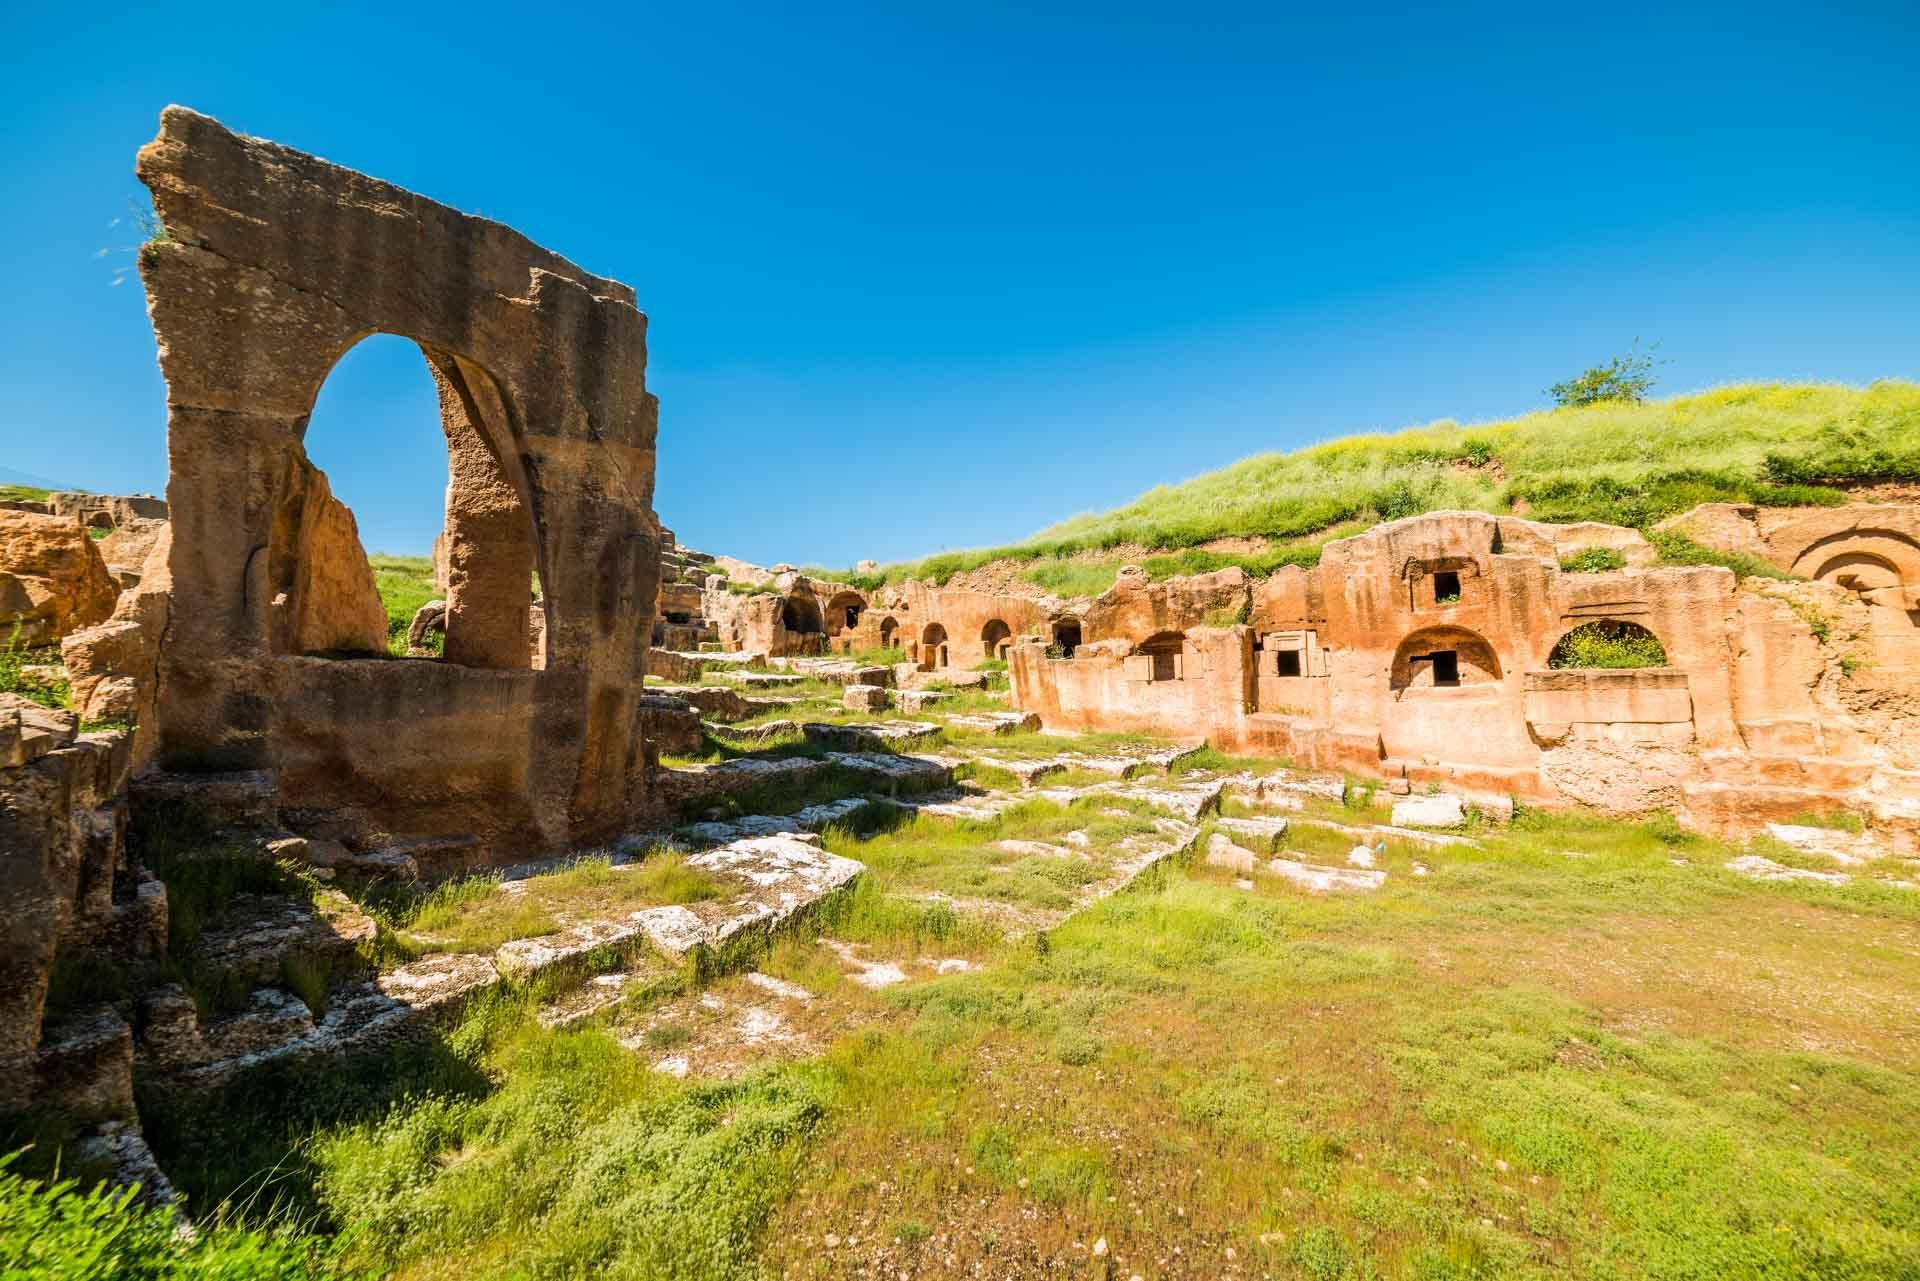 La nécropole antique de Dara © shutterstock